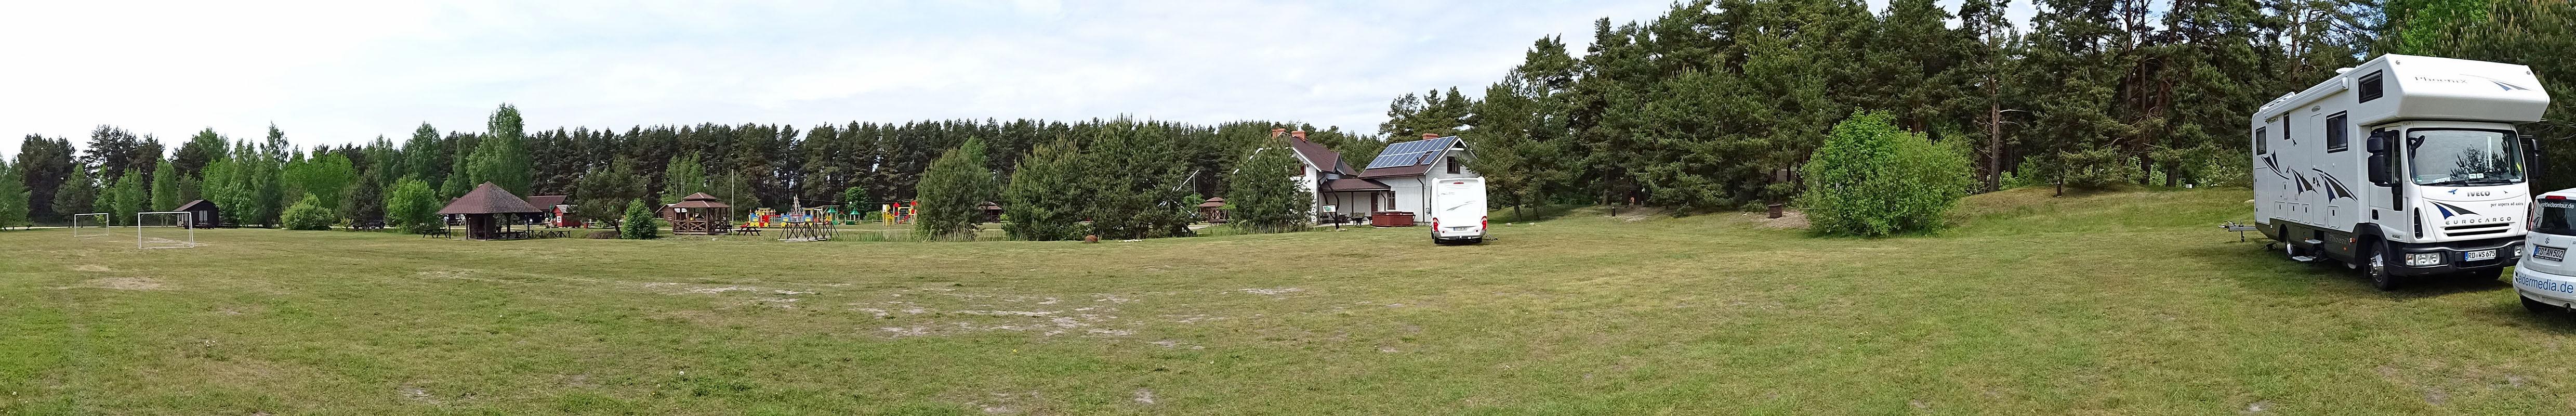 Am Ziel: Campingplatz Verbelnieki, sechs Kilometer südlich von Liepaja